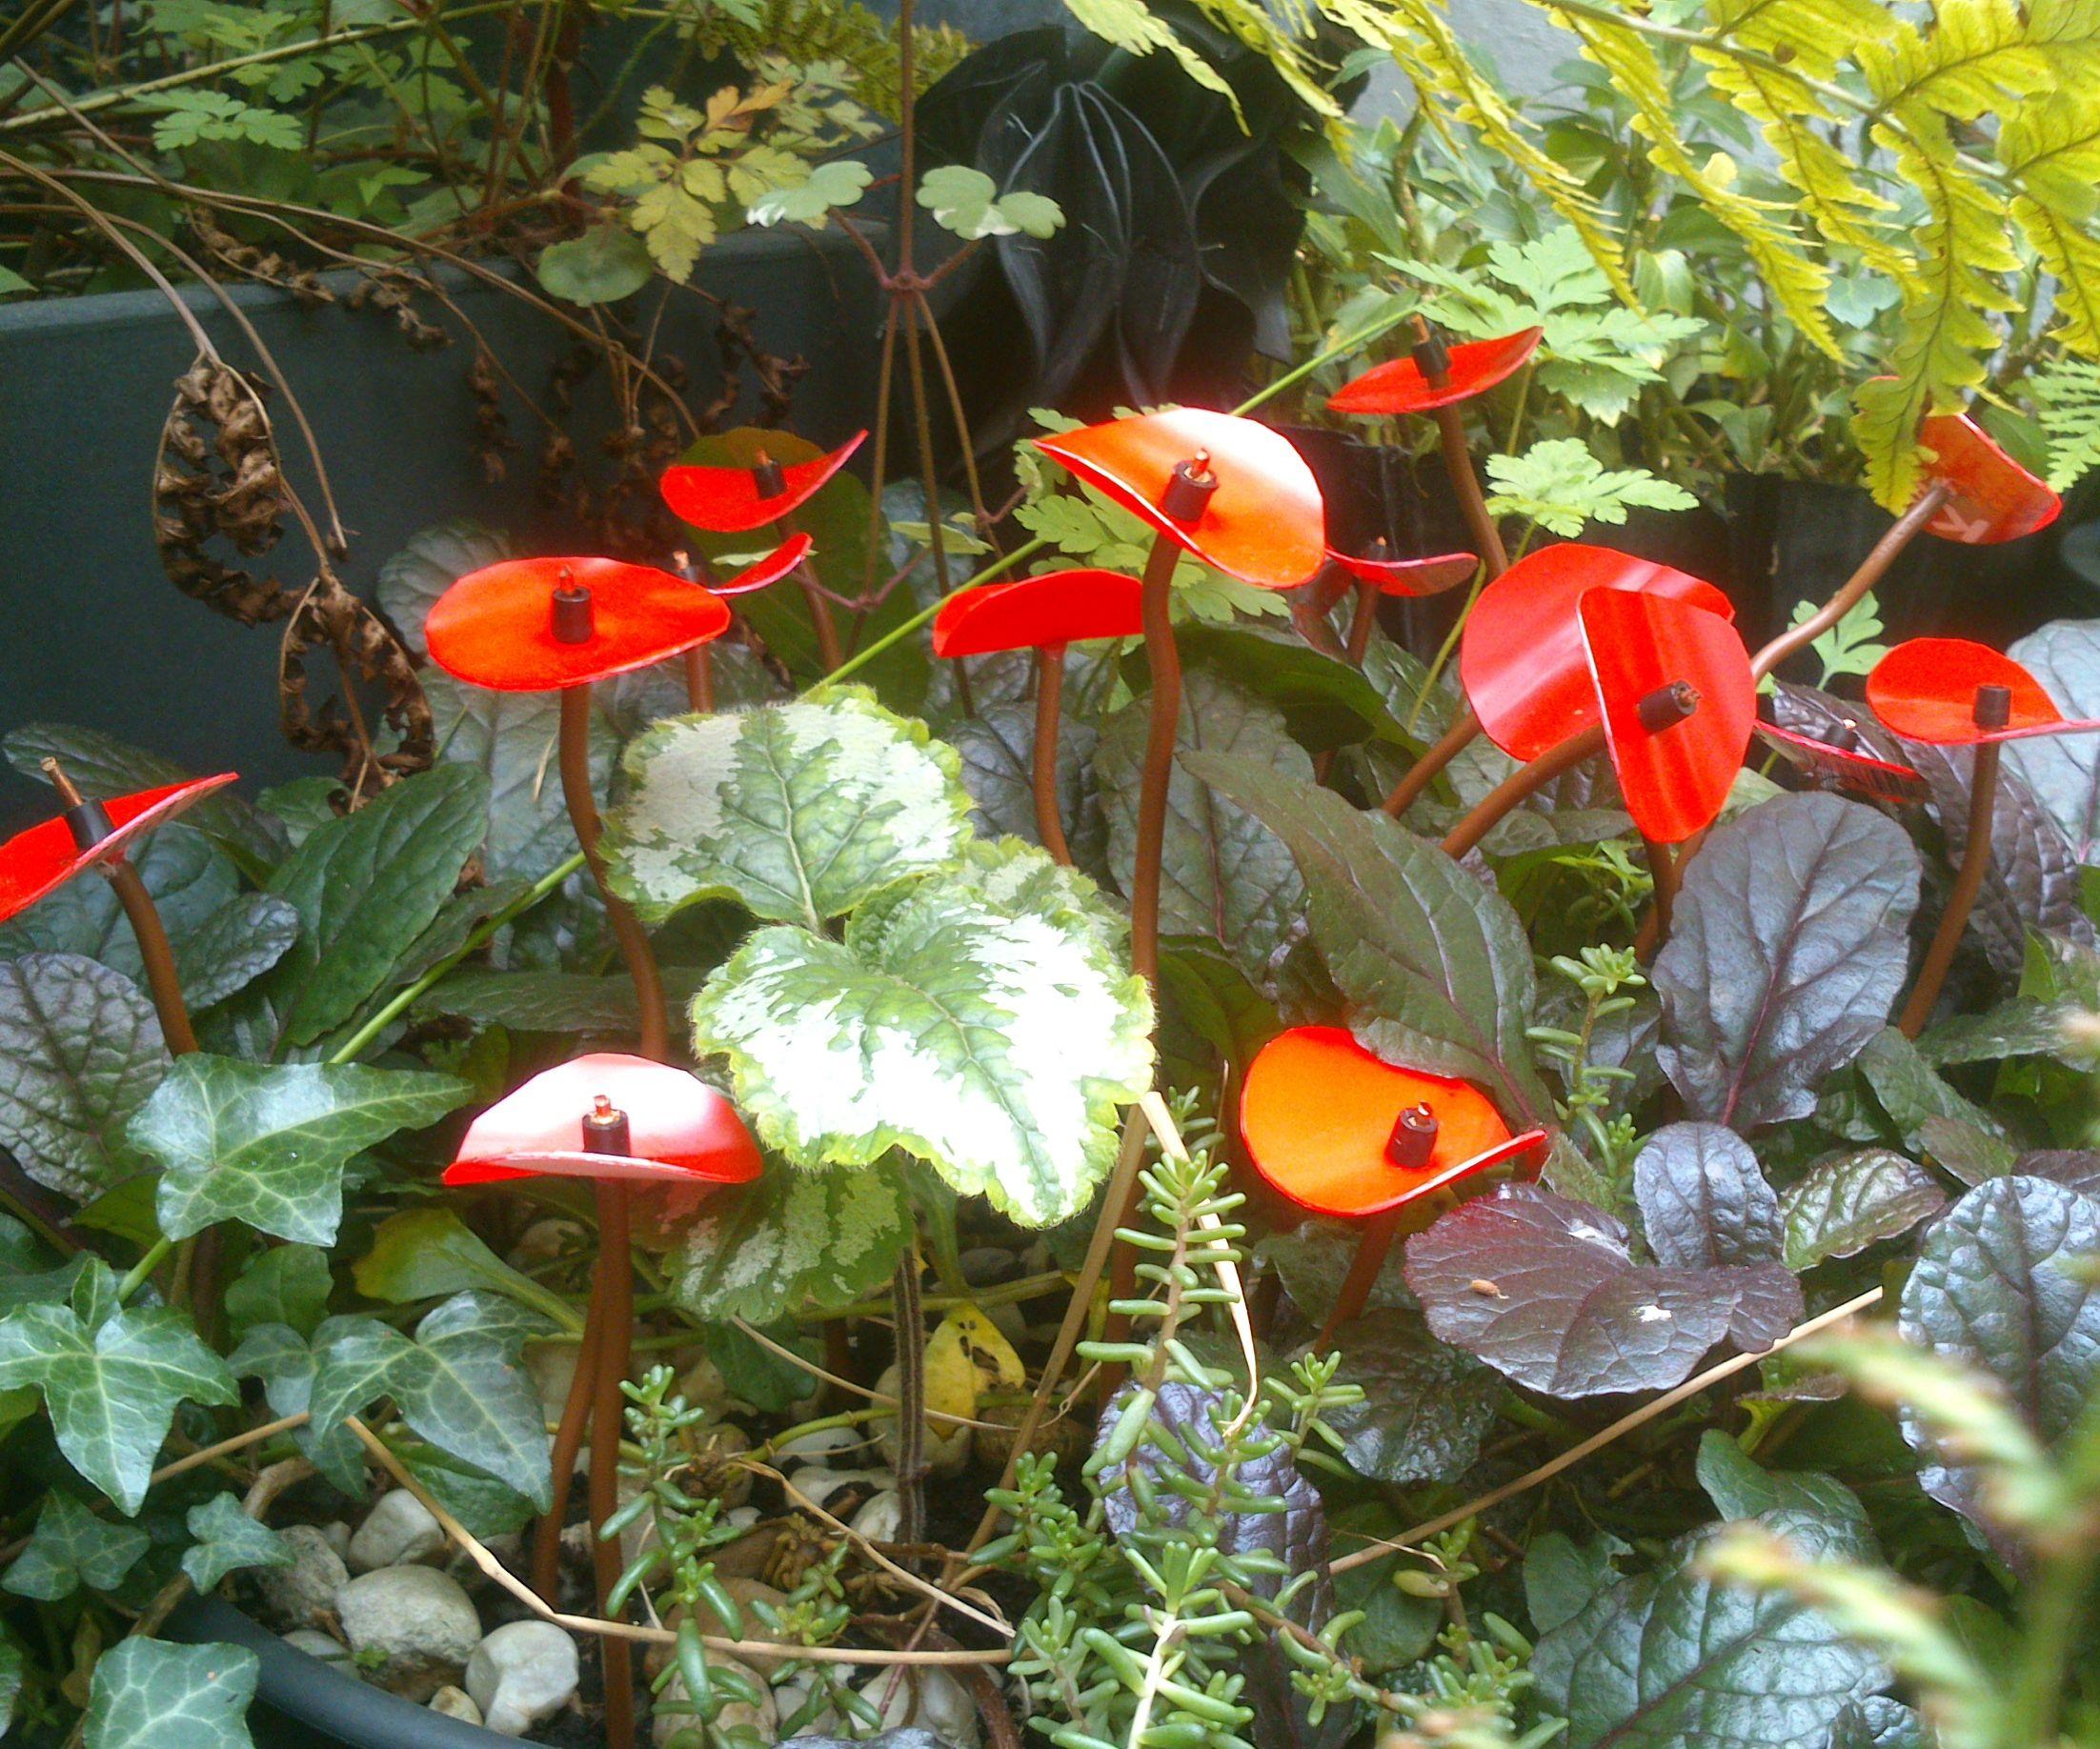 Ornamental plastic flowers